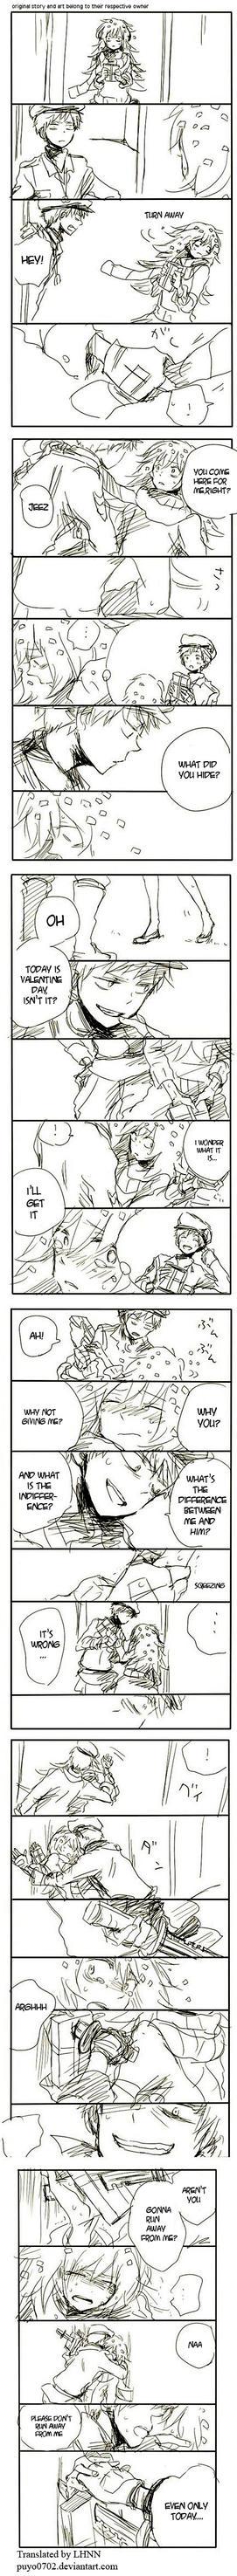 HTF doujinshi translation #5 by minglee7294